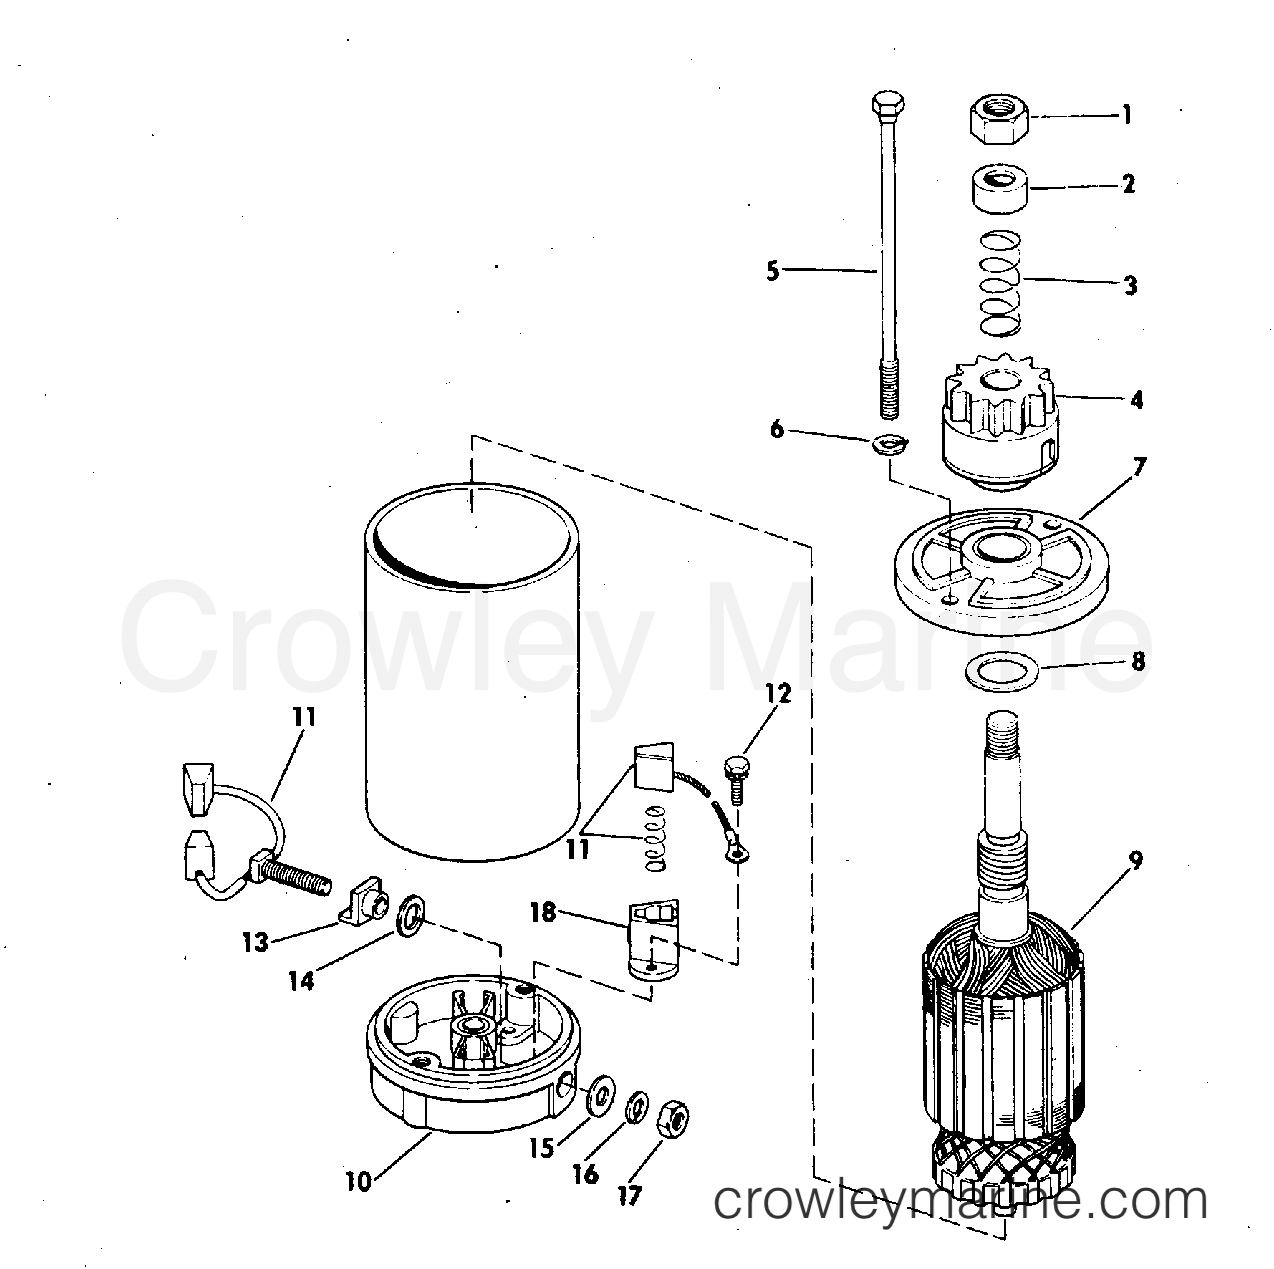 ELECTRIC STARTER AMERICAN BOSCH SMH 12B41 & SMH 12B43